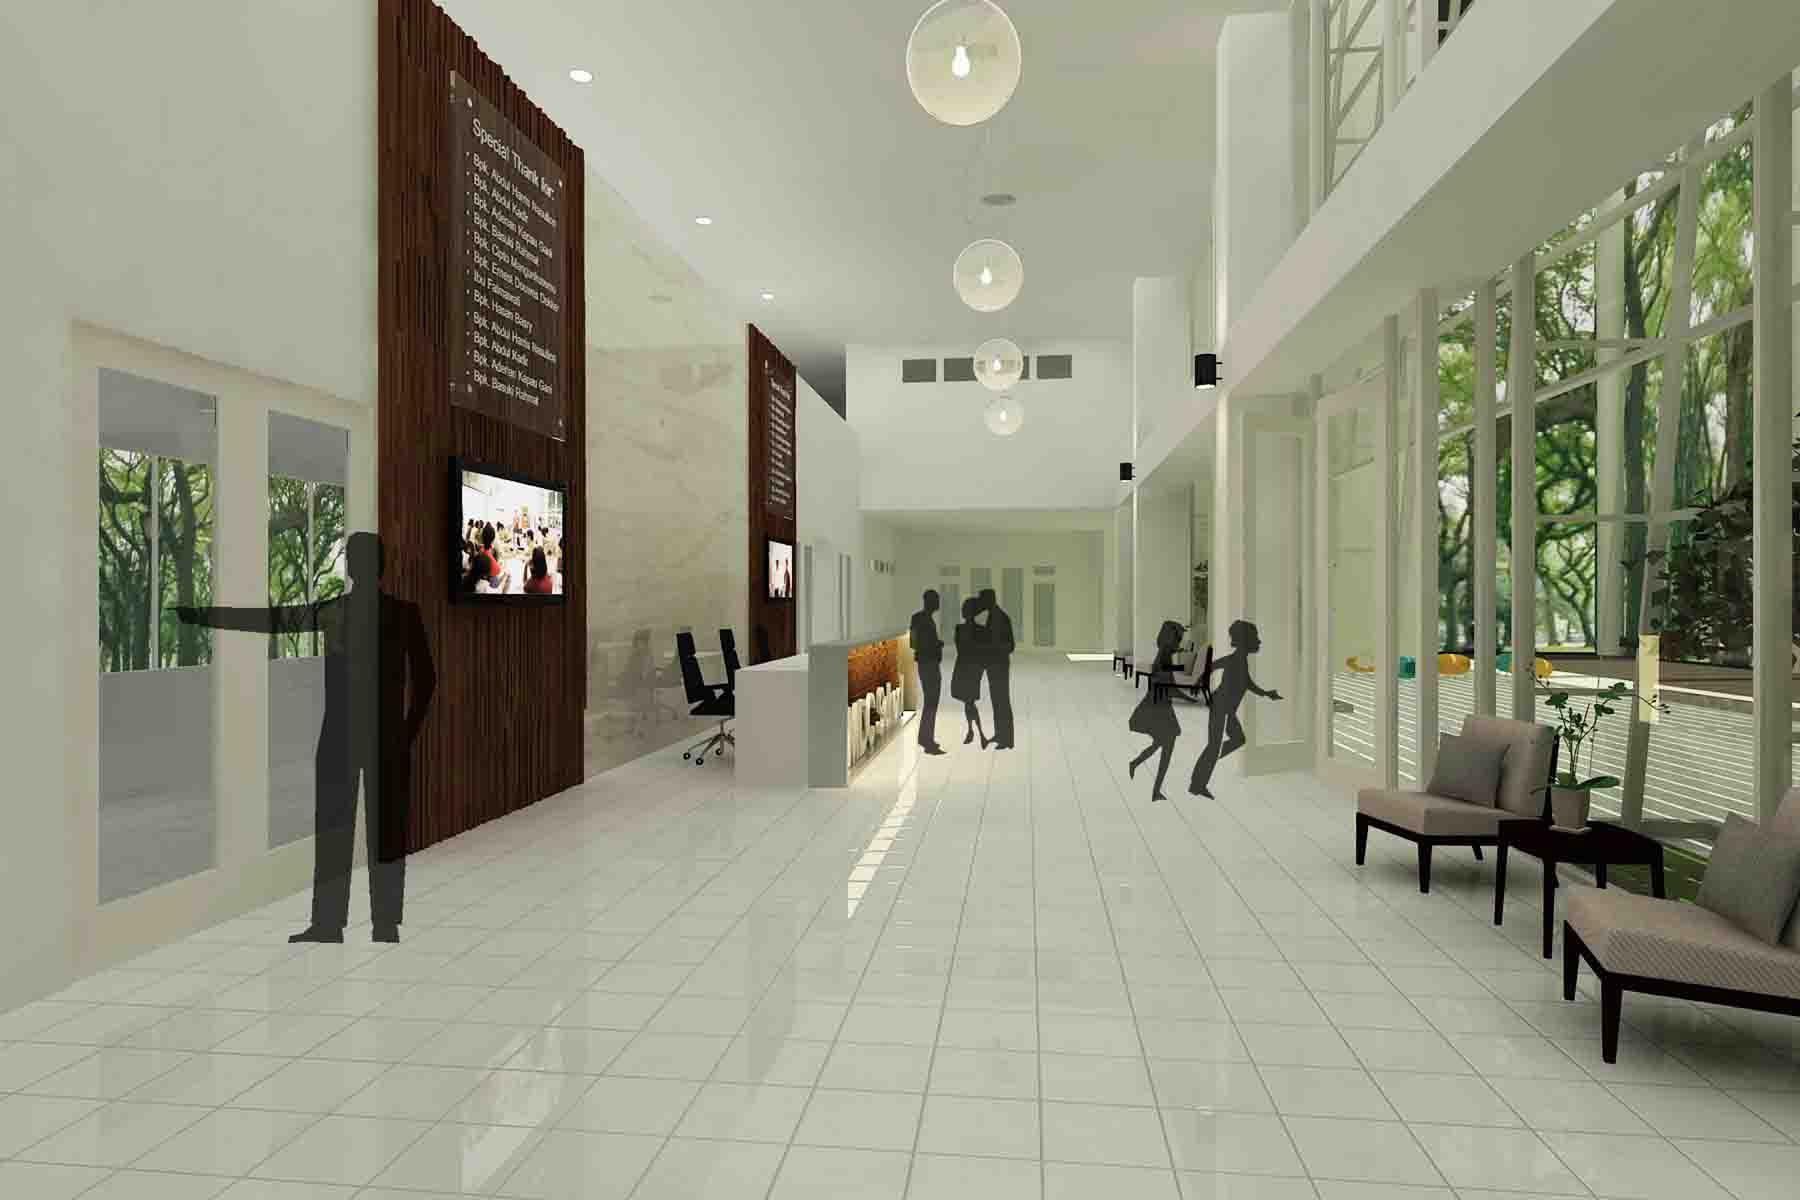 MDC School Design Surabaya By Fesia Prawirya At Coroflot